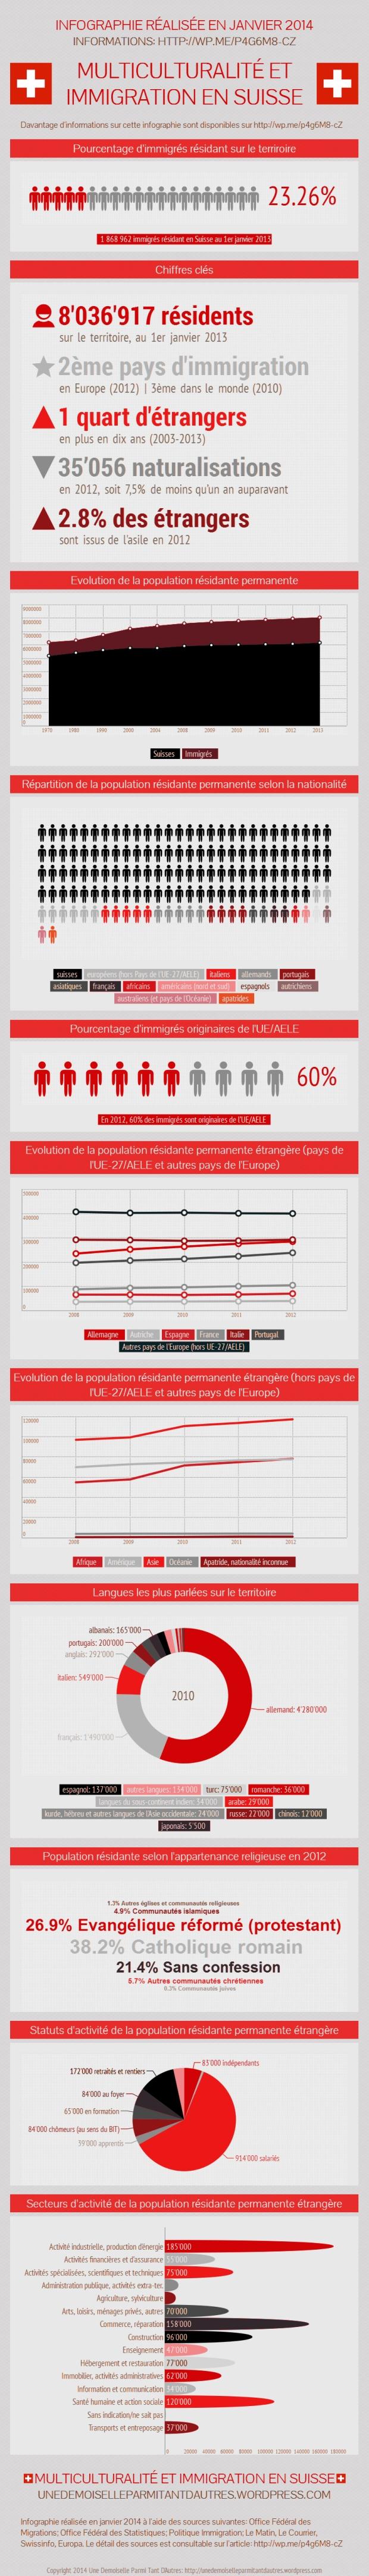 Infographie statistiques immigration multiculturalite en suisse 2014